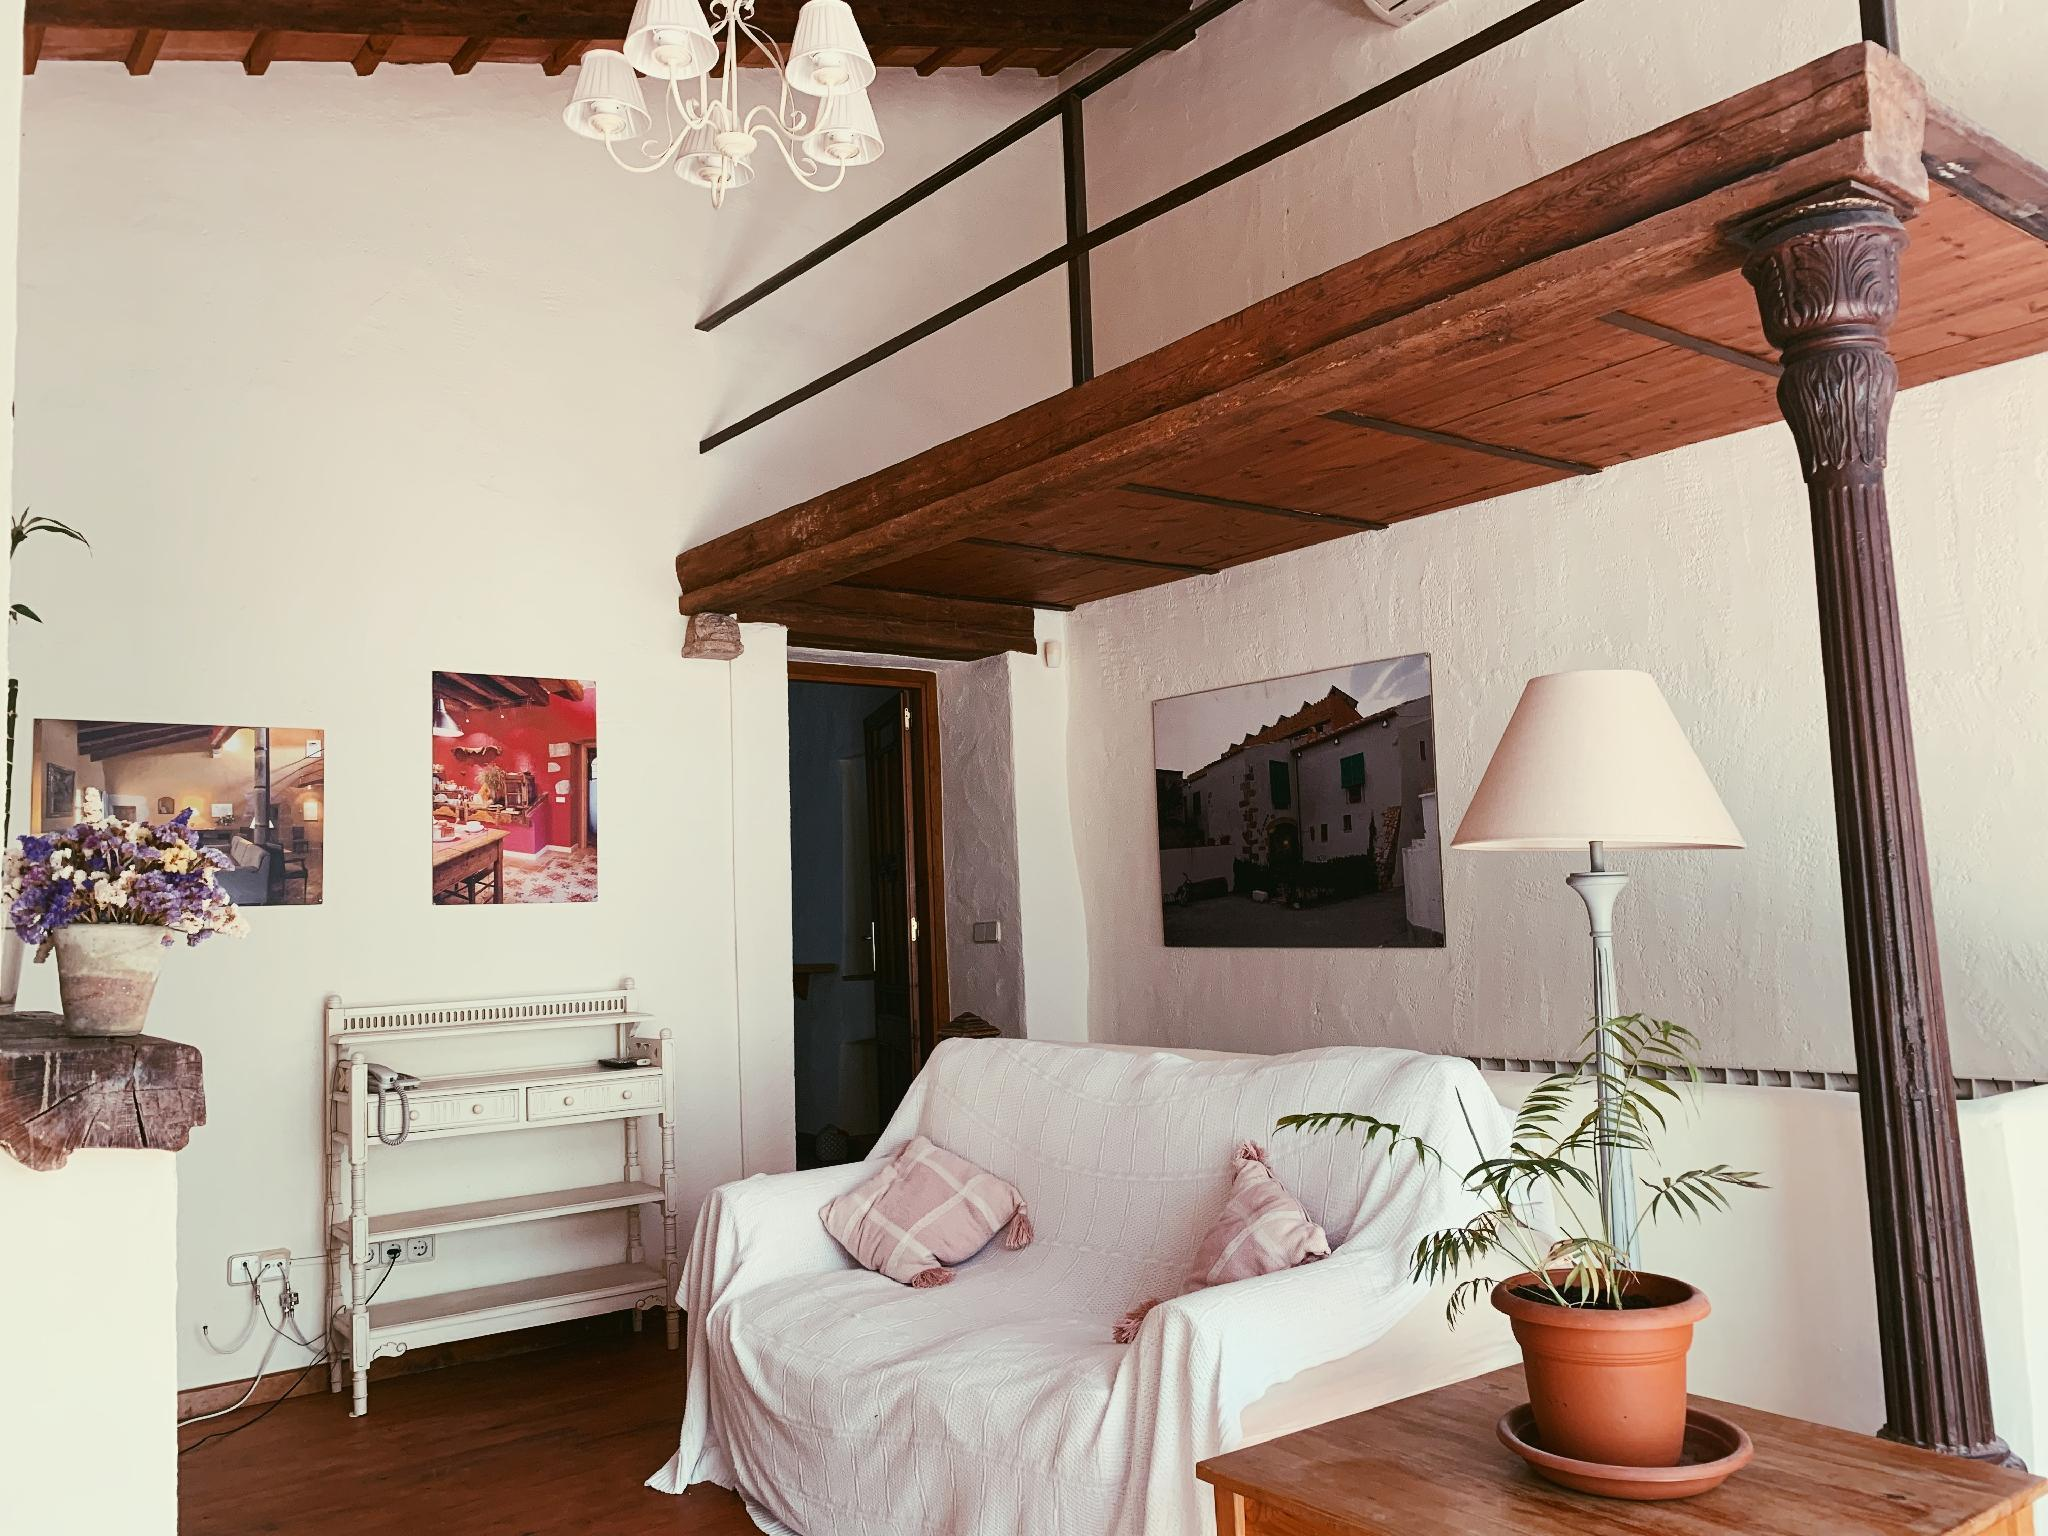 Renovated Country House In Costa Brava   2 Bedroom